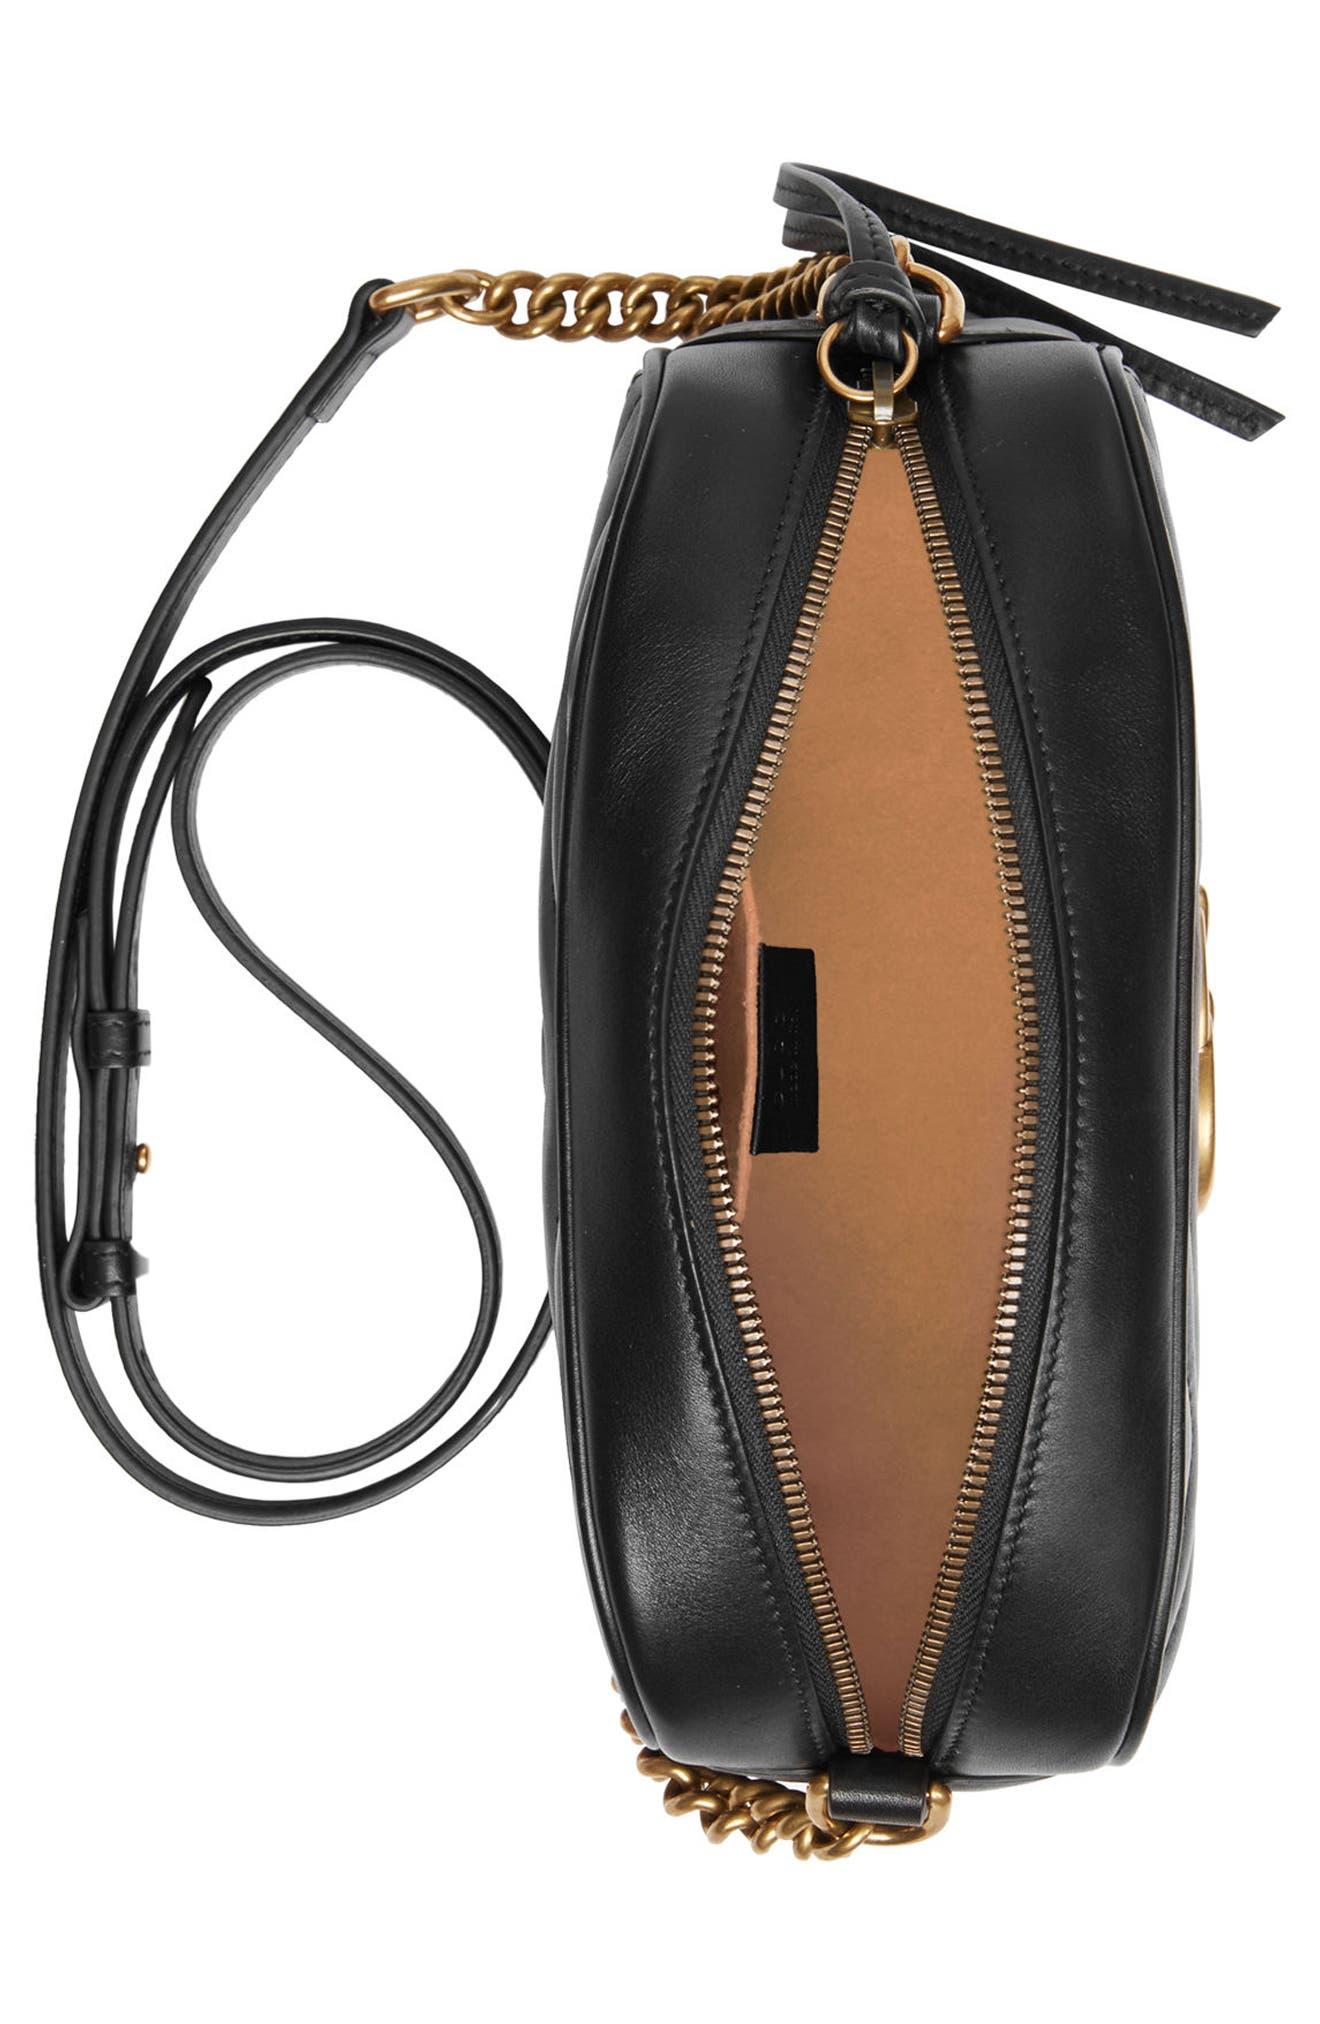 GUCCI,                             GG Marmont 2.0 Matelassé Leather Camera Bag,                             Alternate thumbnail 3, color,                             001